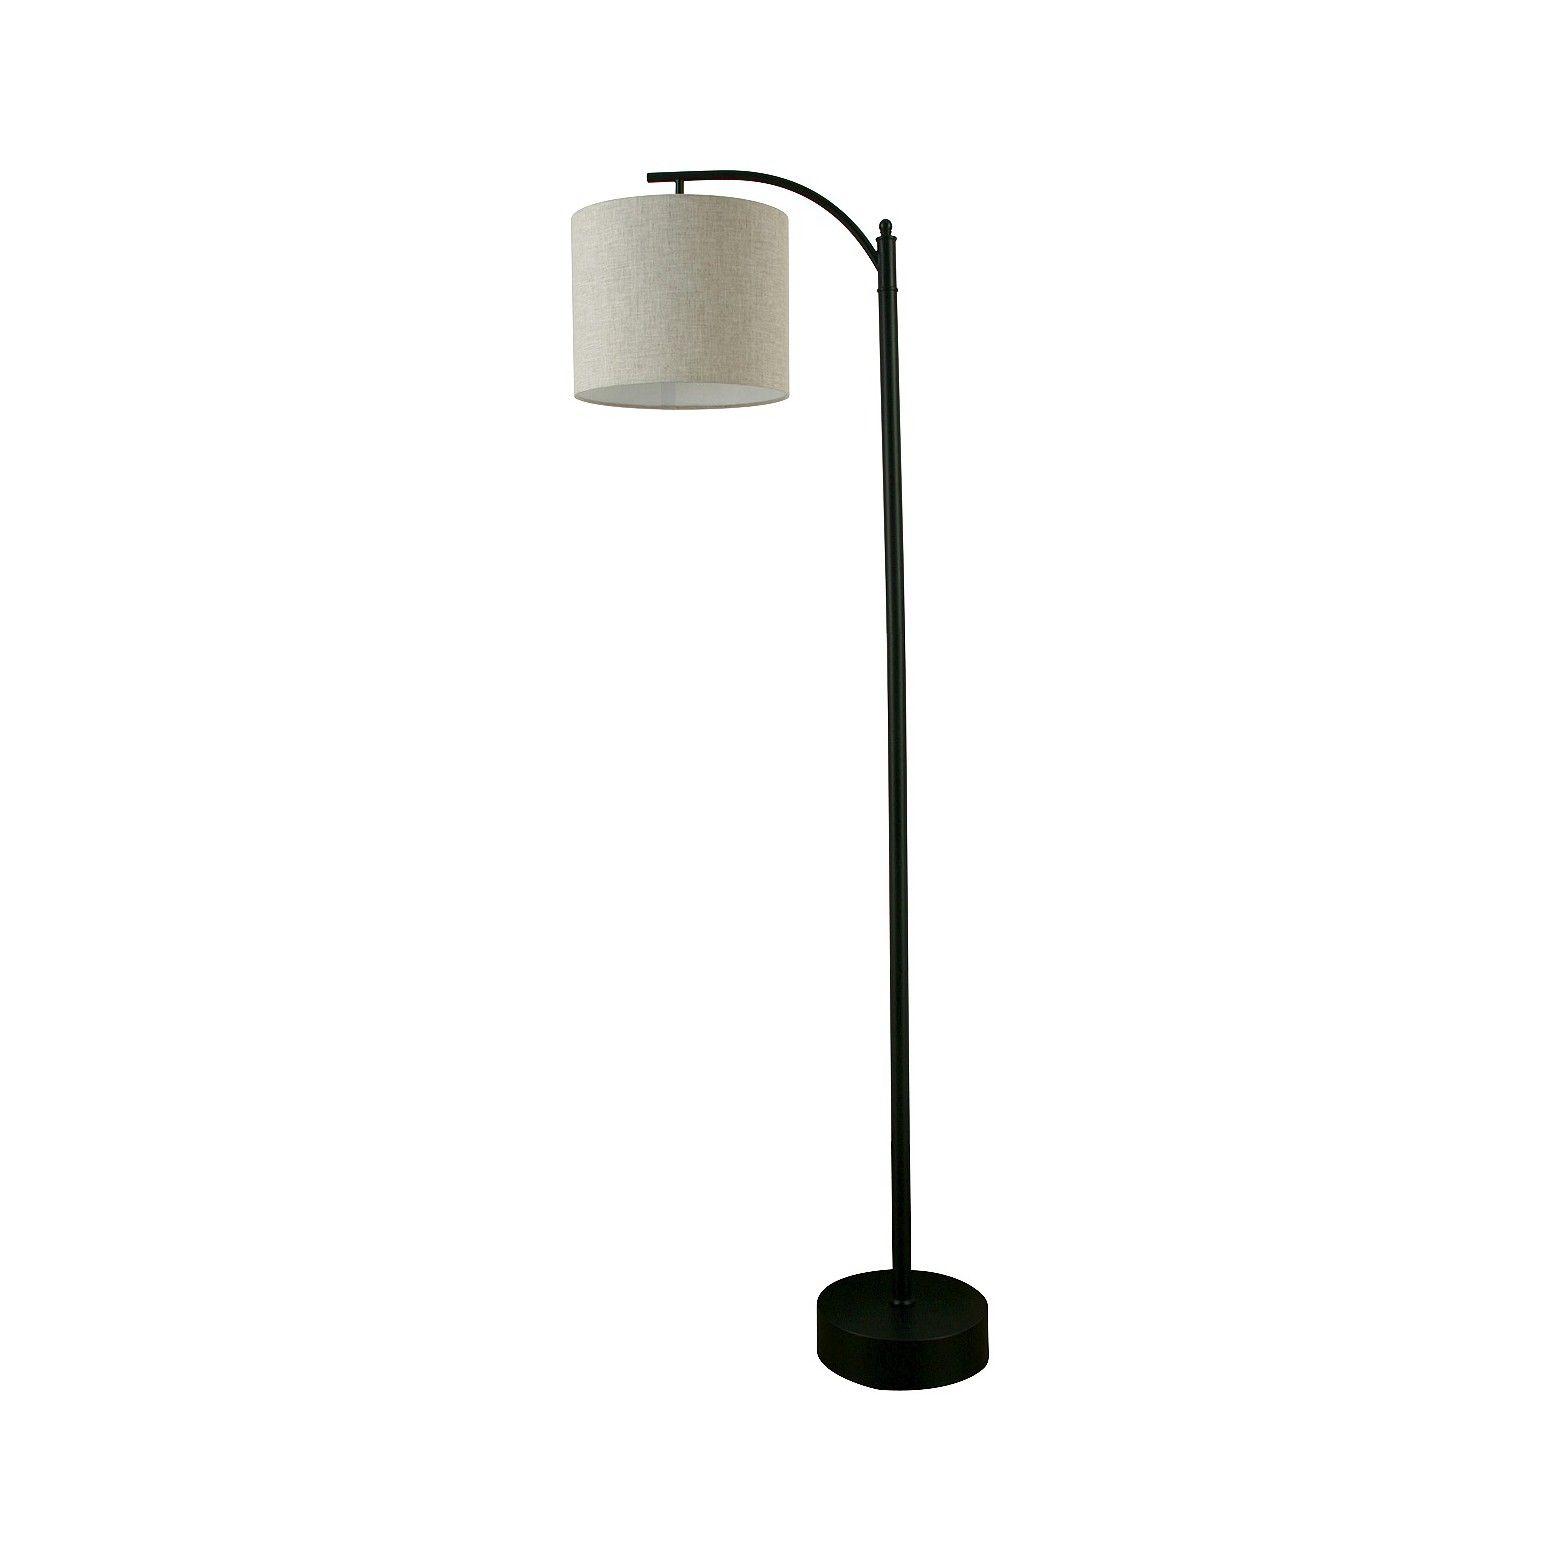 Pin By Erika Gustafson Marletta On Living Room Target Floor Lamps Lamp Floor Lamp